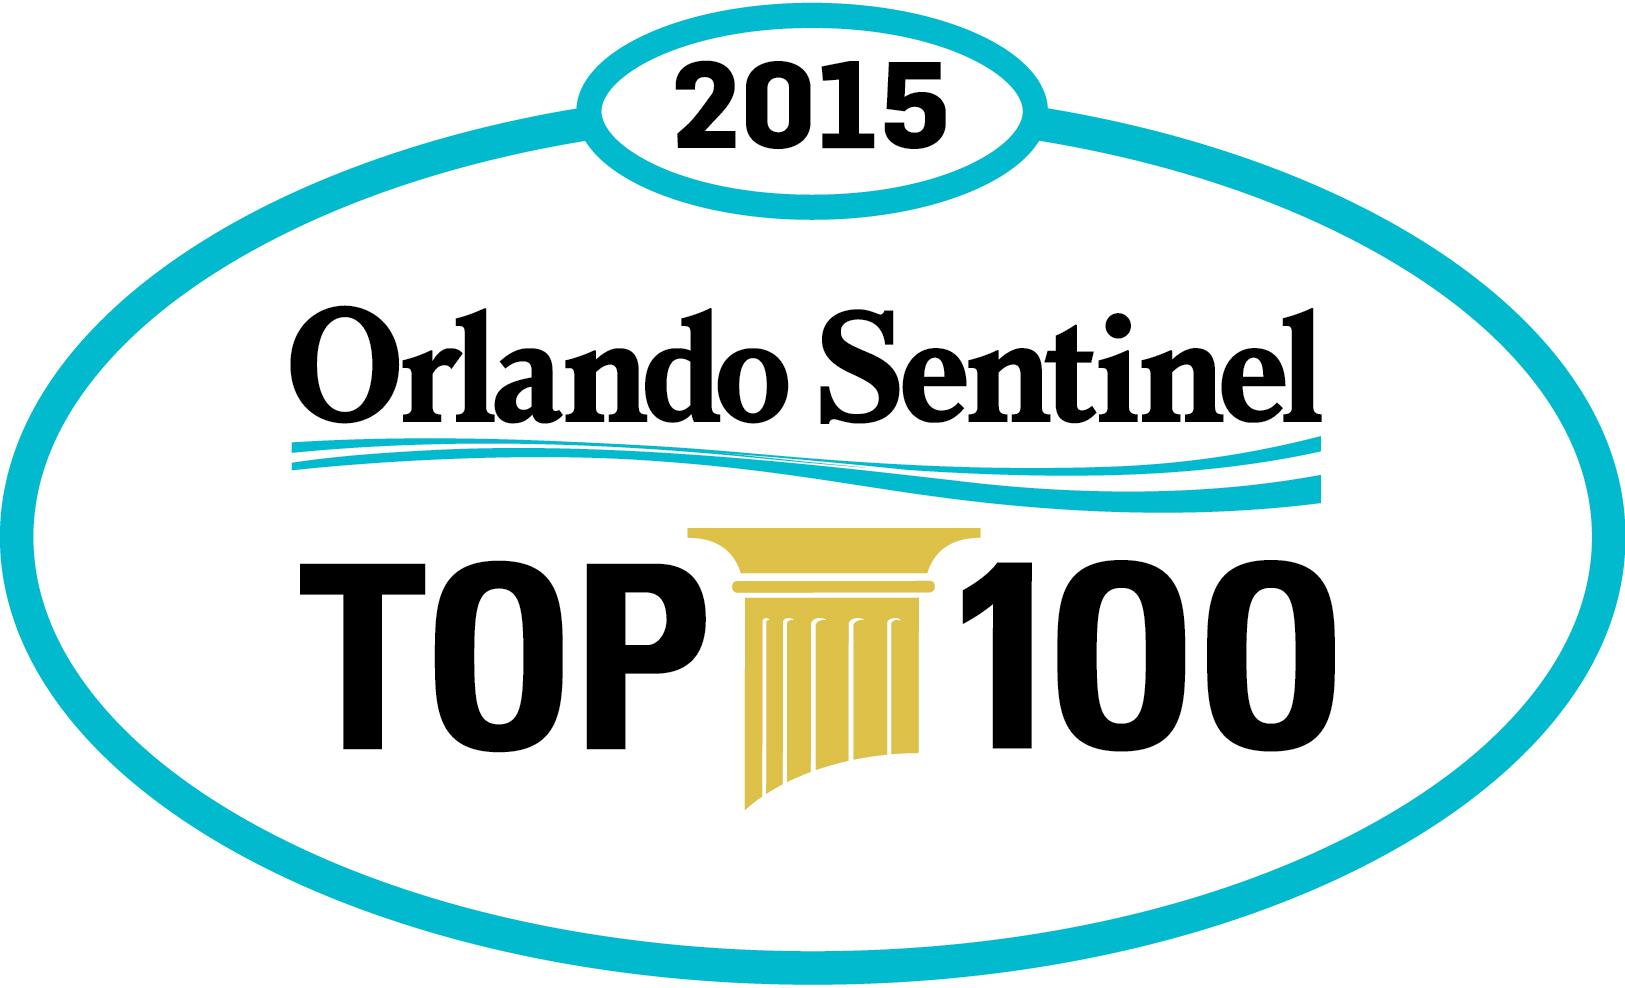 Orlando Sentinel Top 100 - 2015